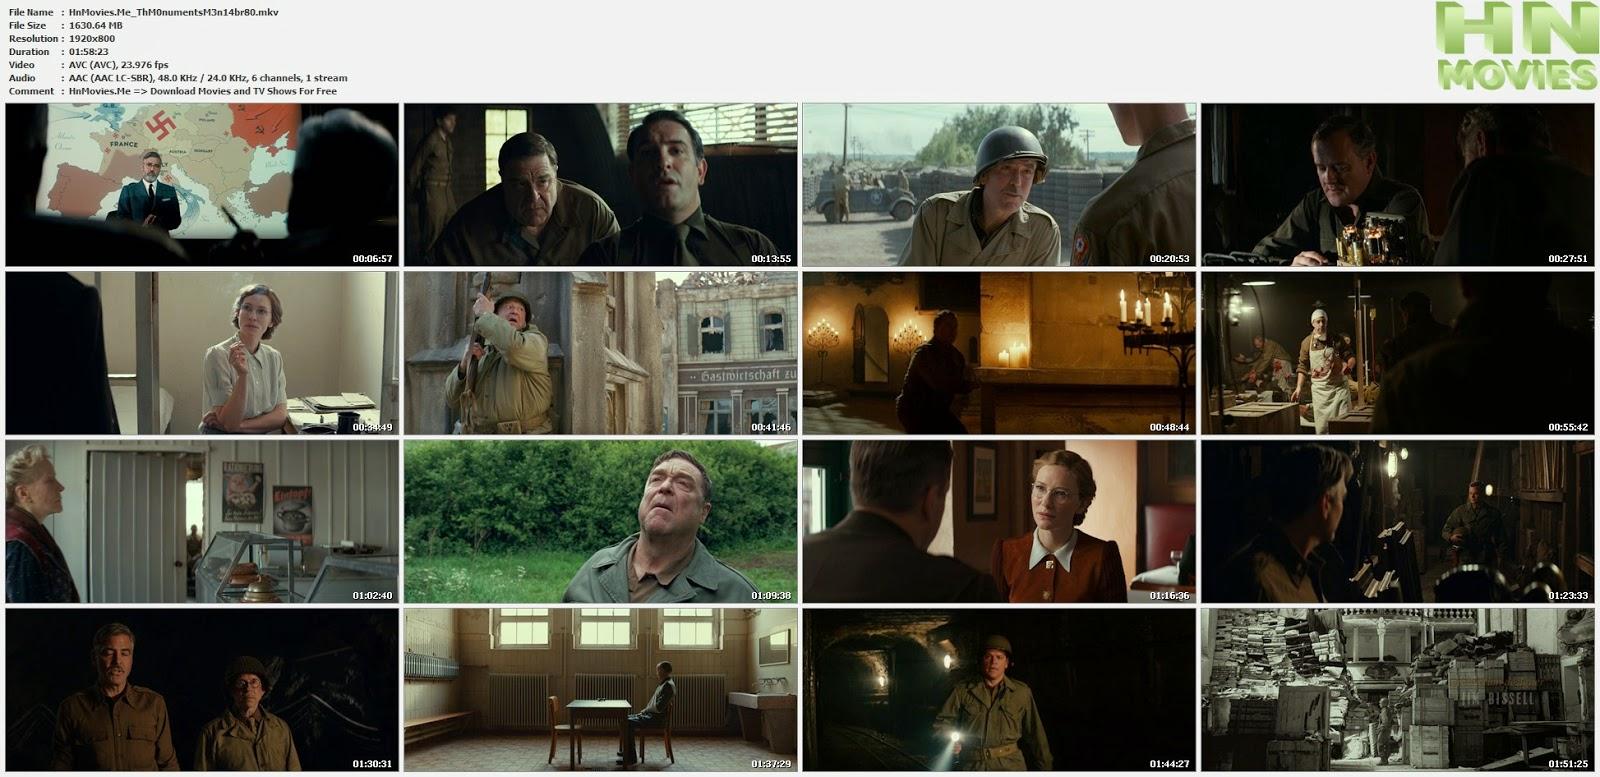 movie screenshot of The Monuments Men fdmovie.com